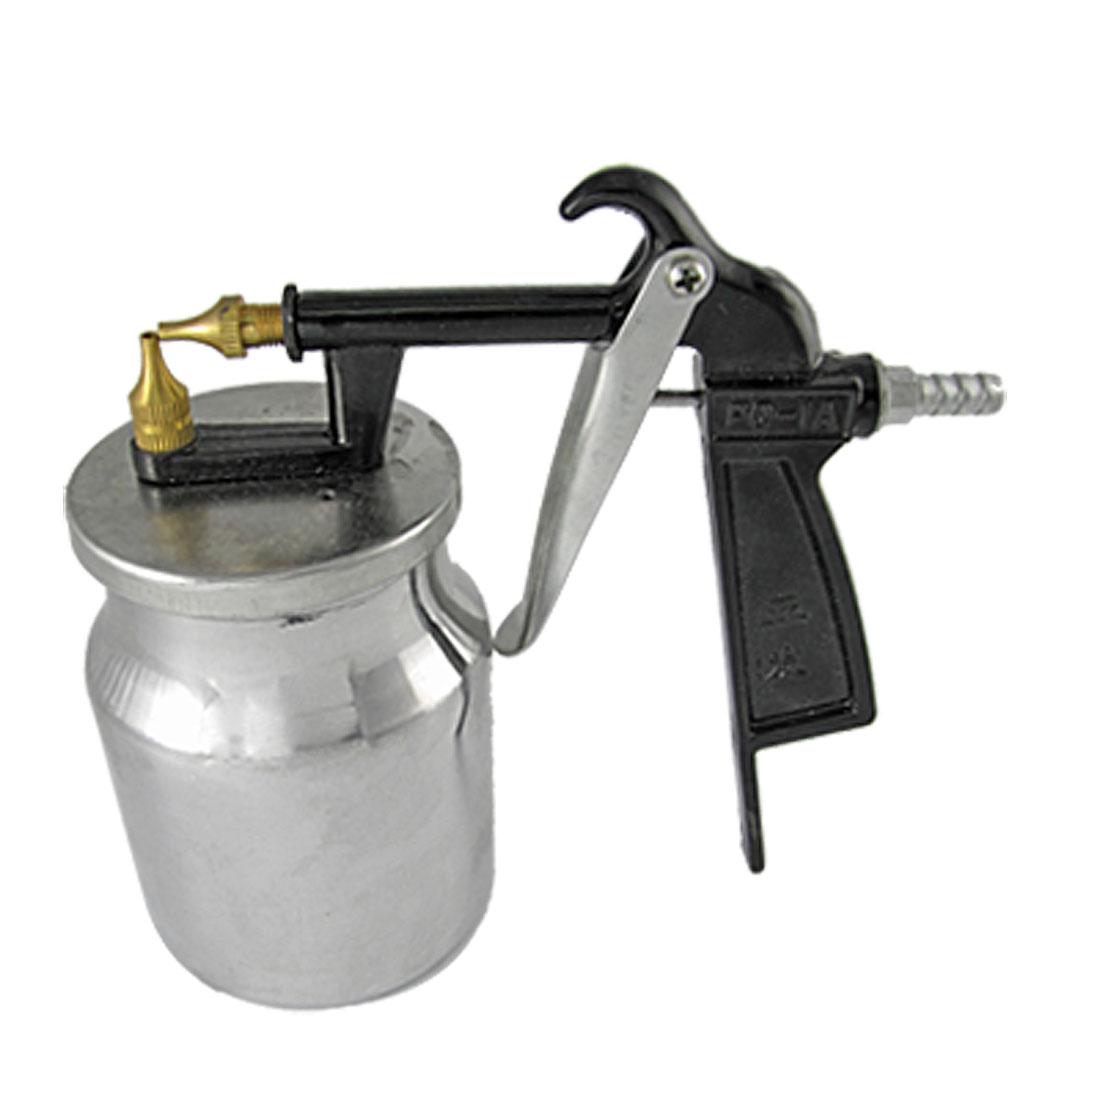 Mini Air Tools Touch-up Paint Compressed Air Spray Gun